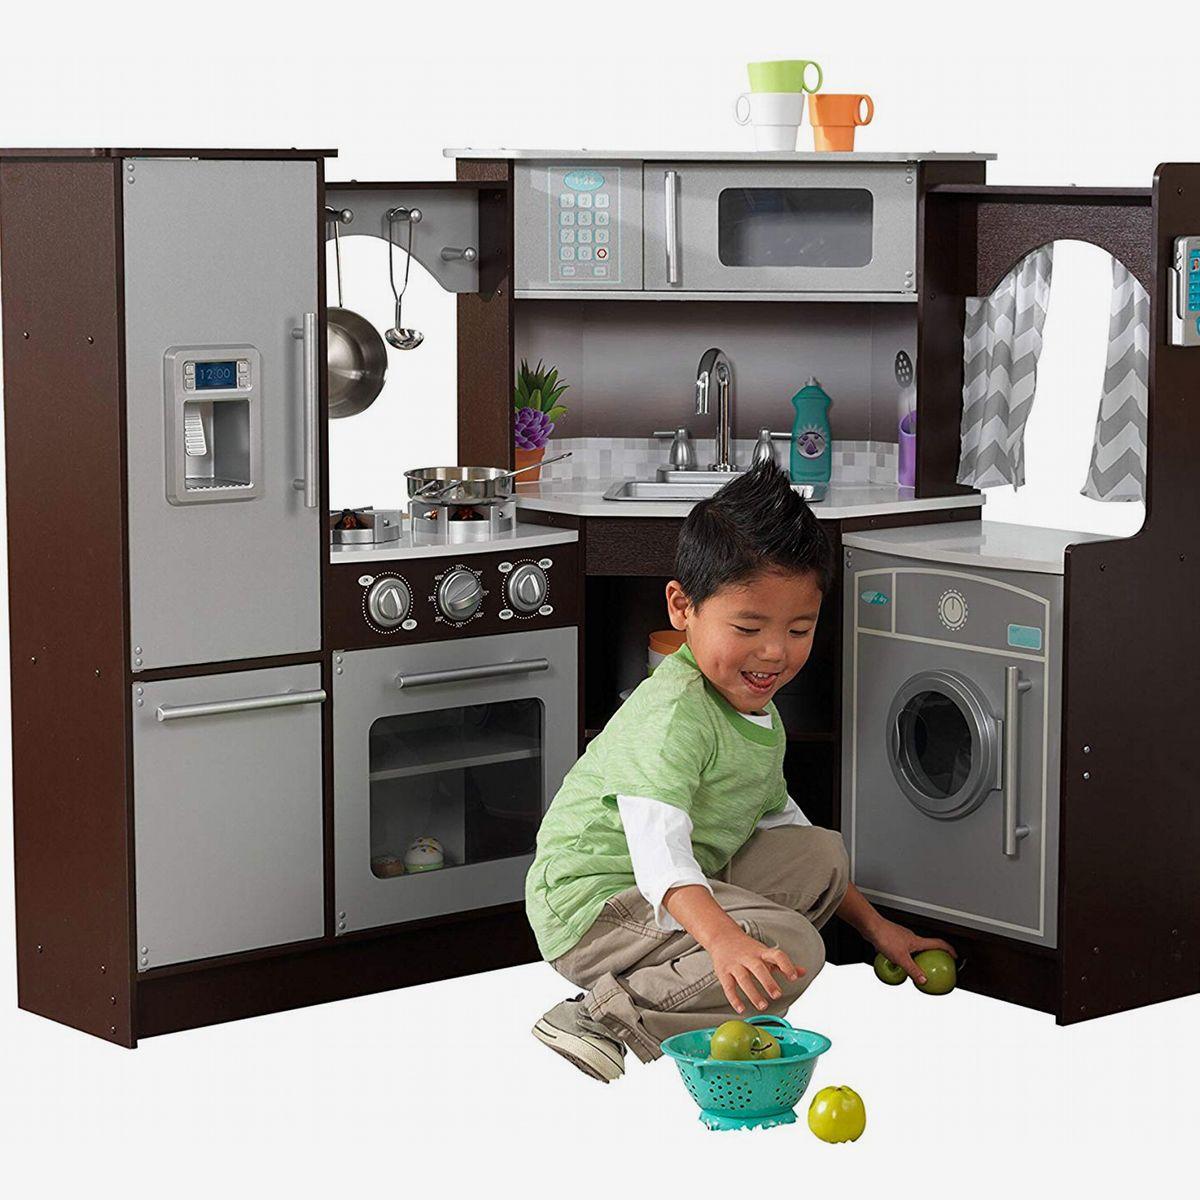 4 Best Toy Kitchen Sets 4  The Strategist  New York Magazine